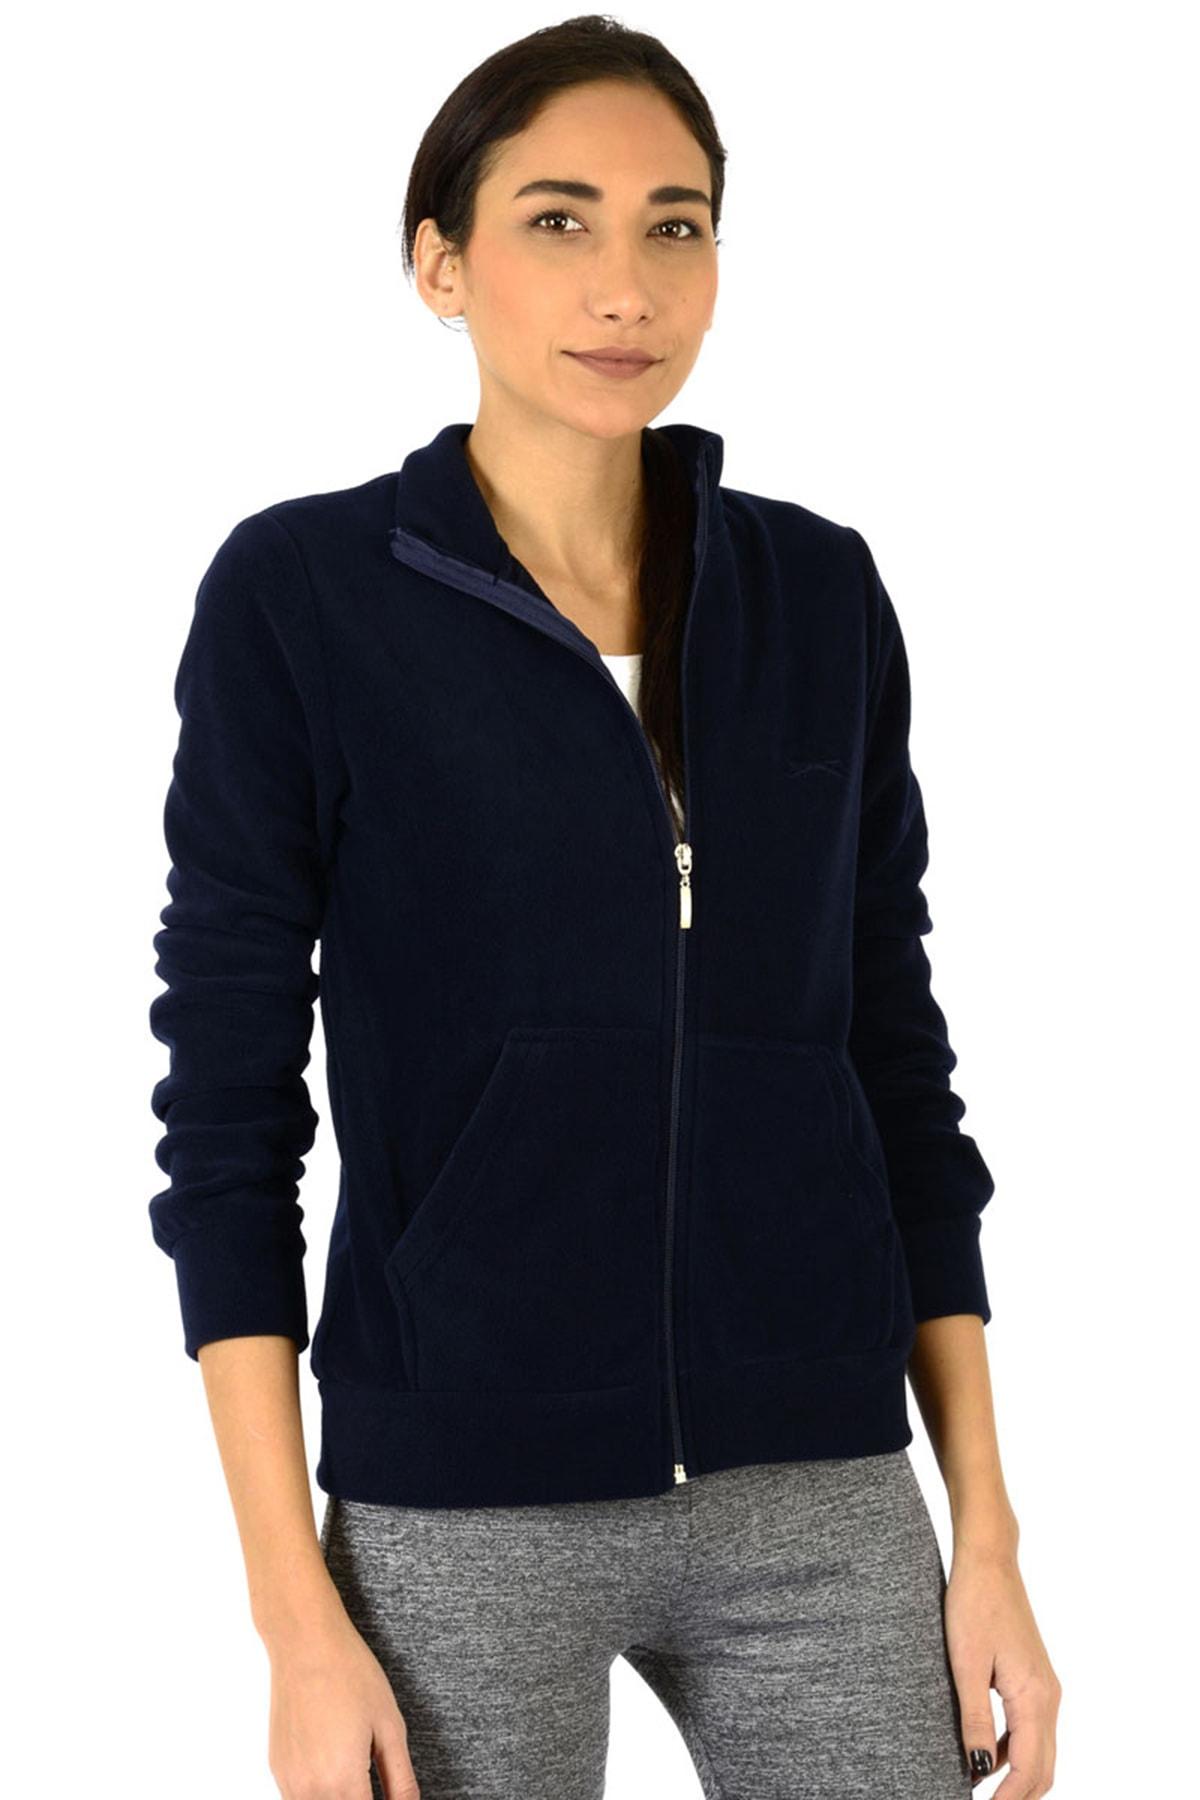 Slazenger Soul I Kadın Sweatshirt Lacivert 2